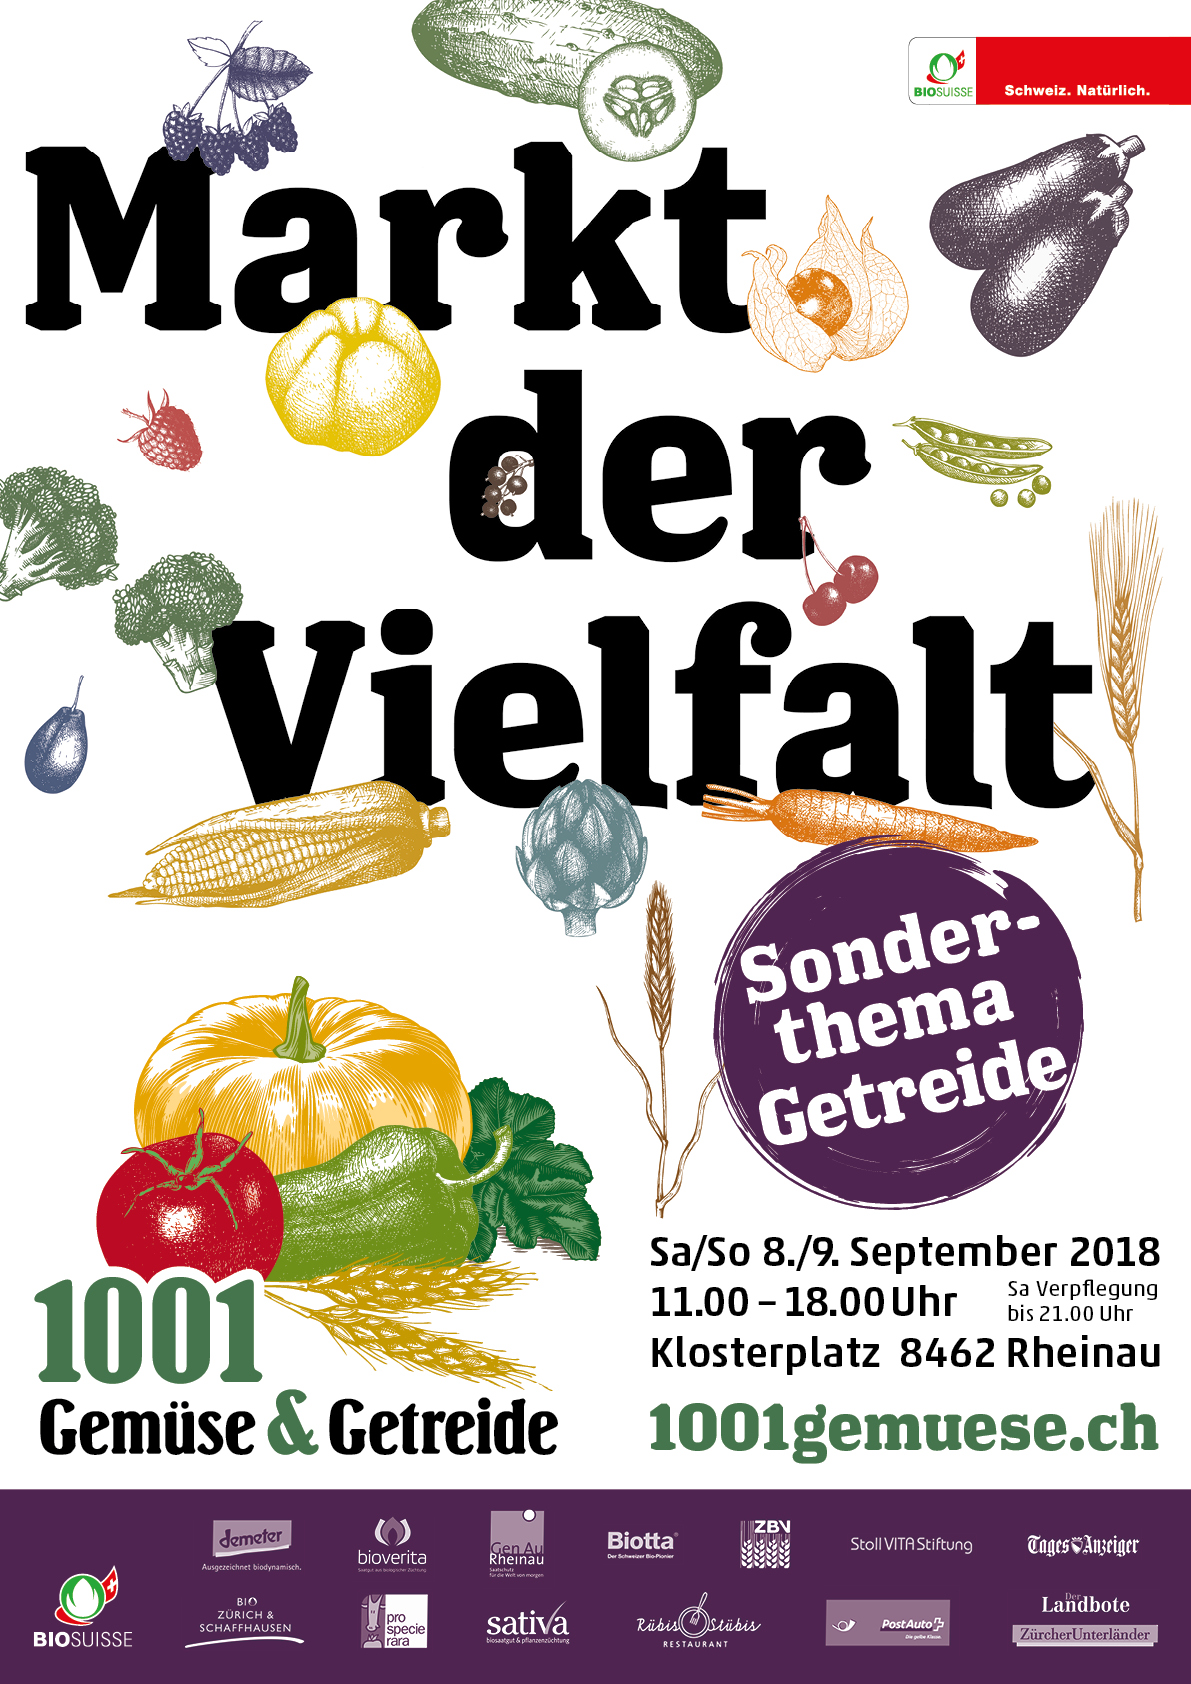 1001 Gemüse&Getreide Plakat F4